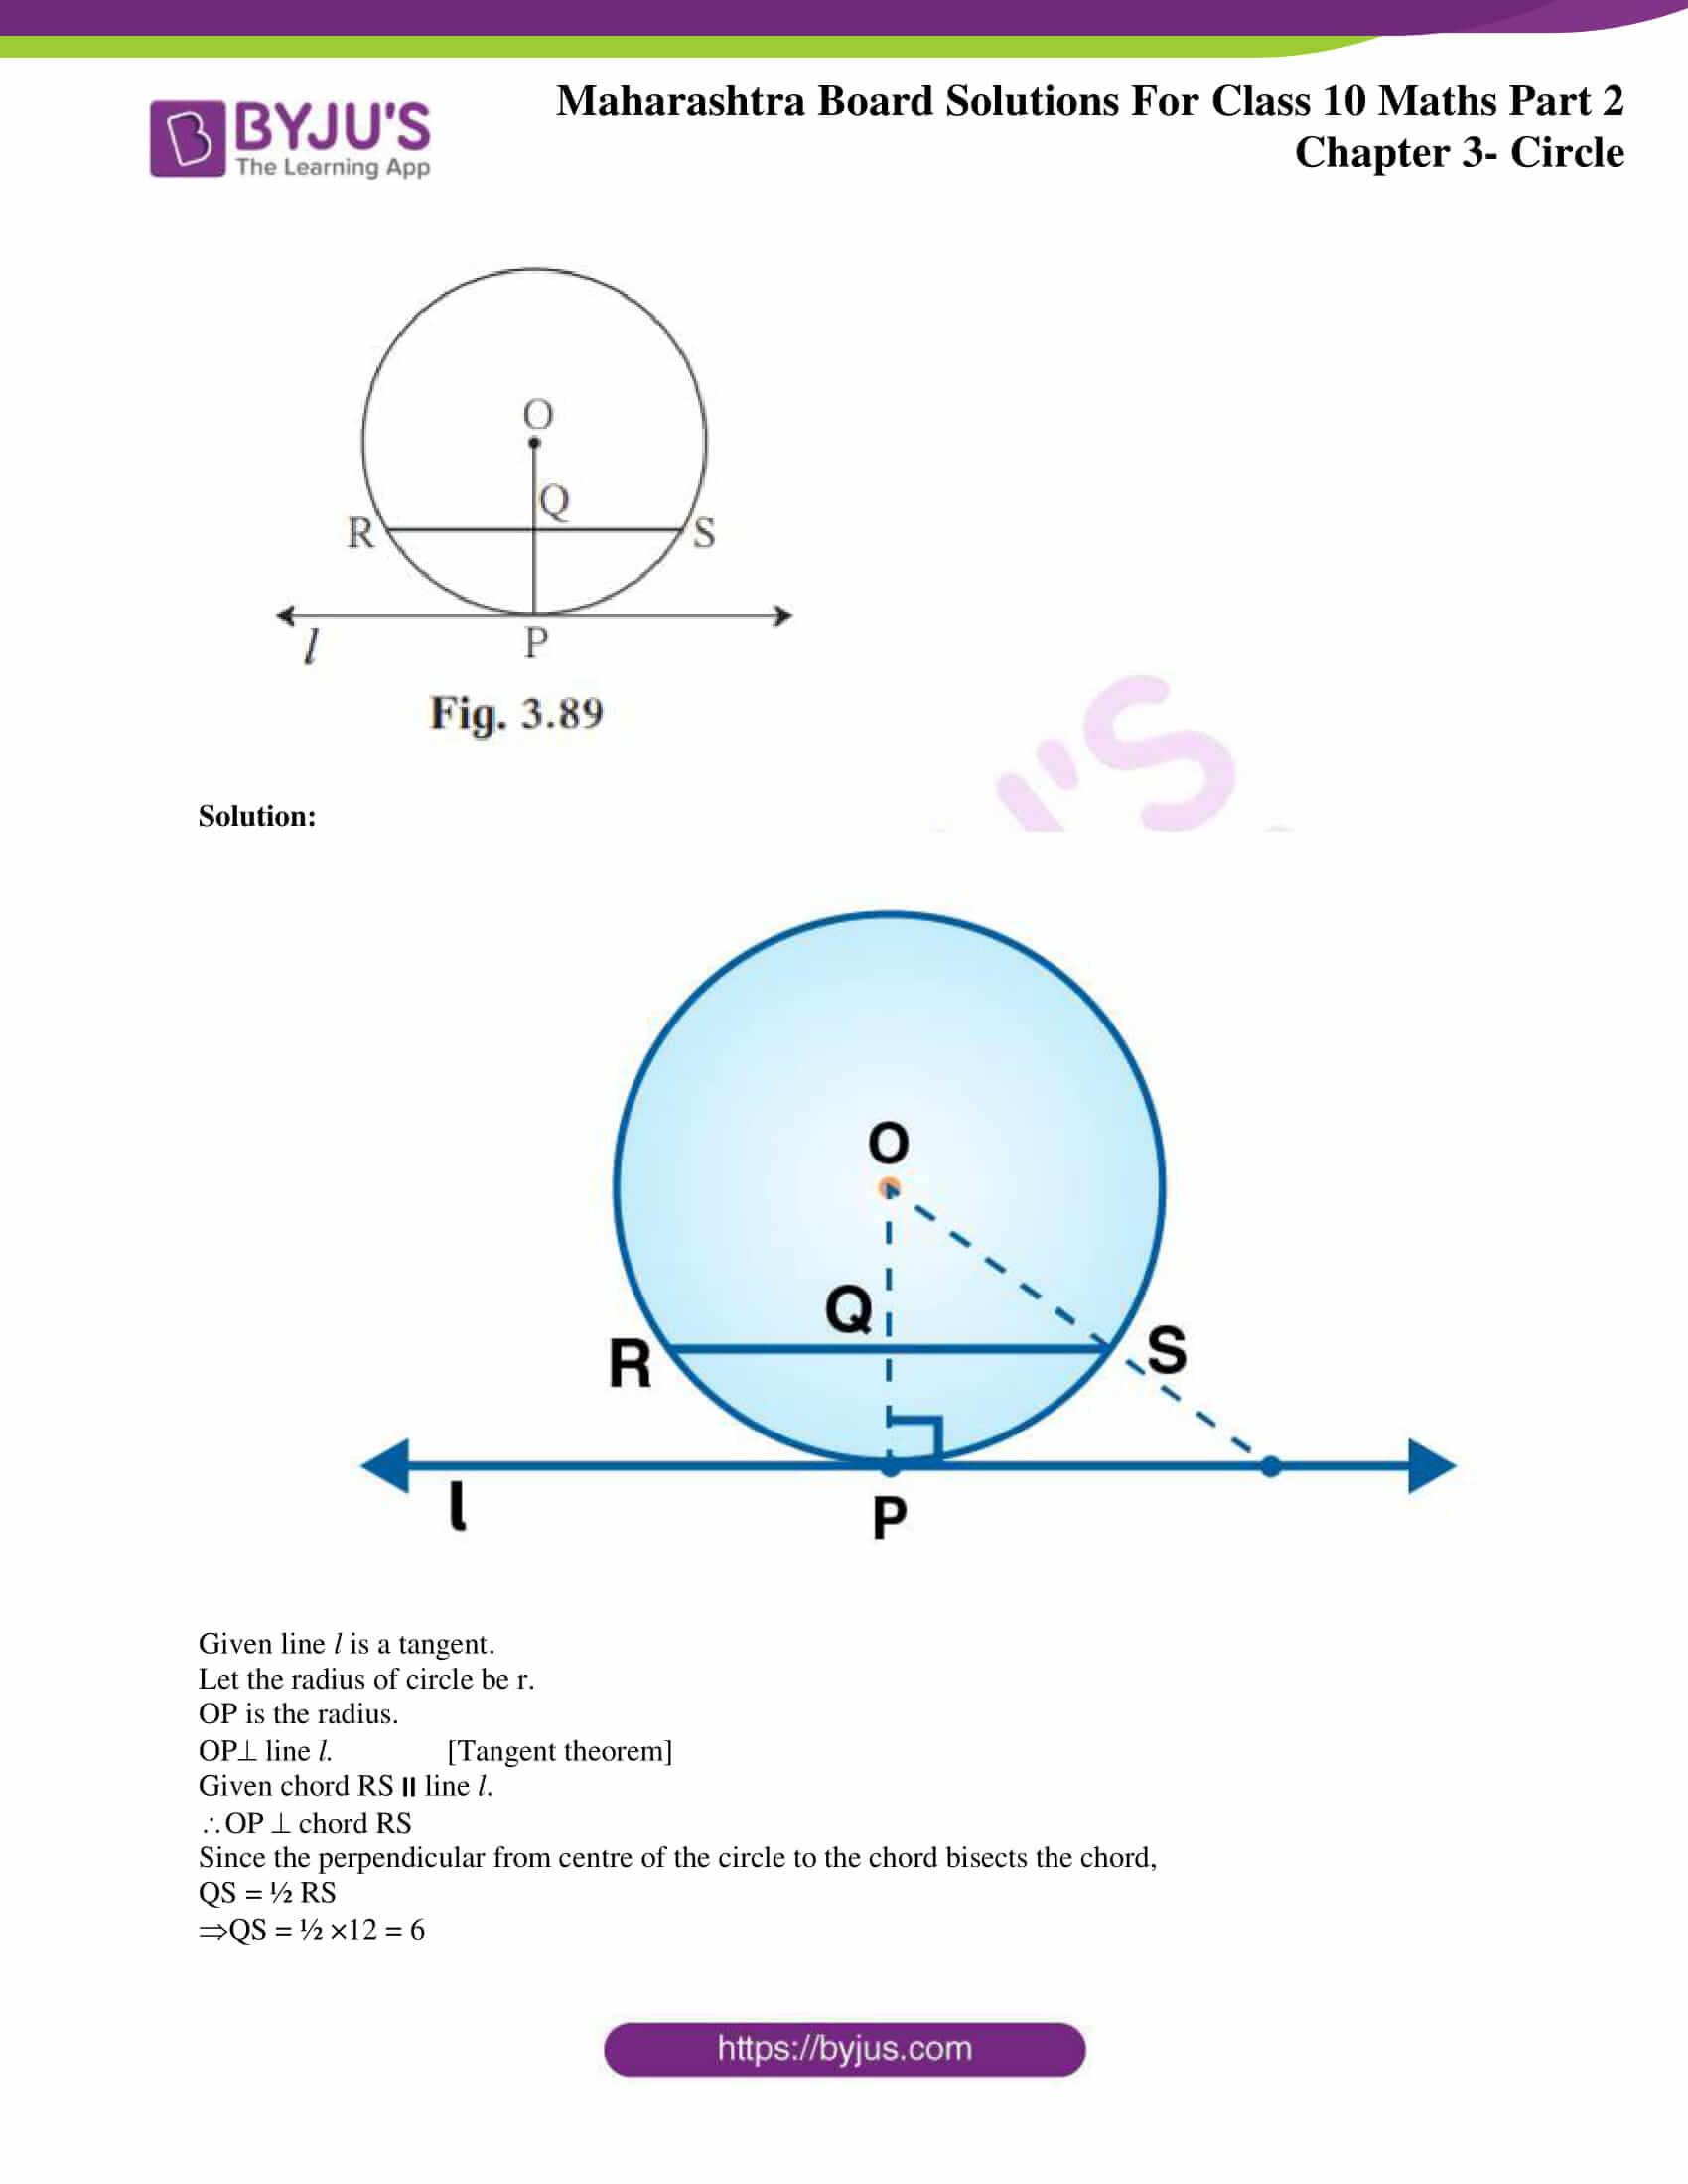 msbshse sol class 10 maths part 2 chapter 3 28